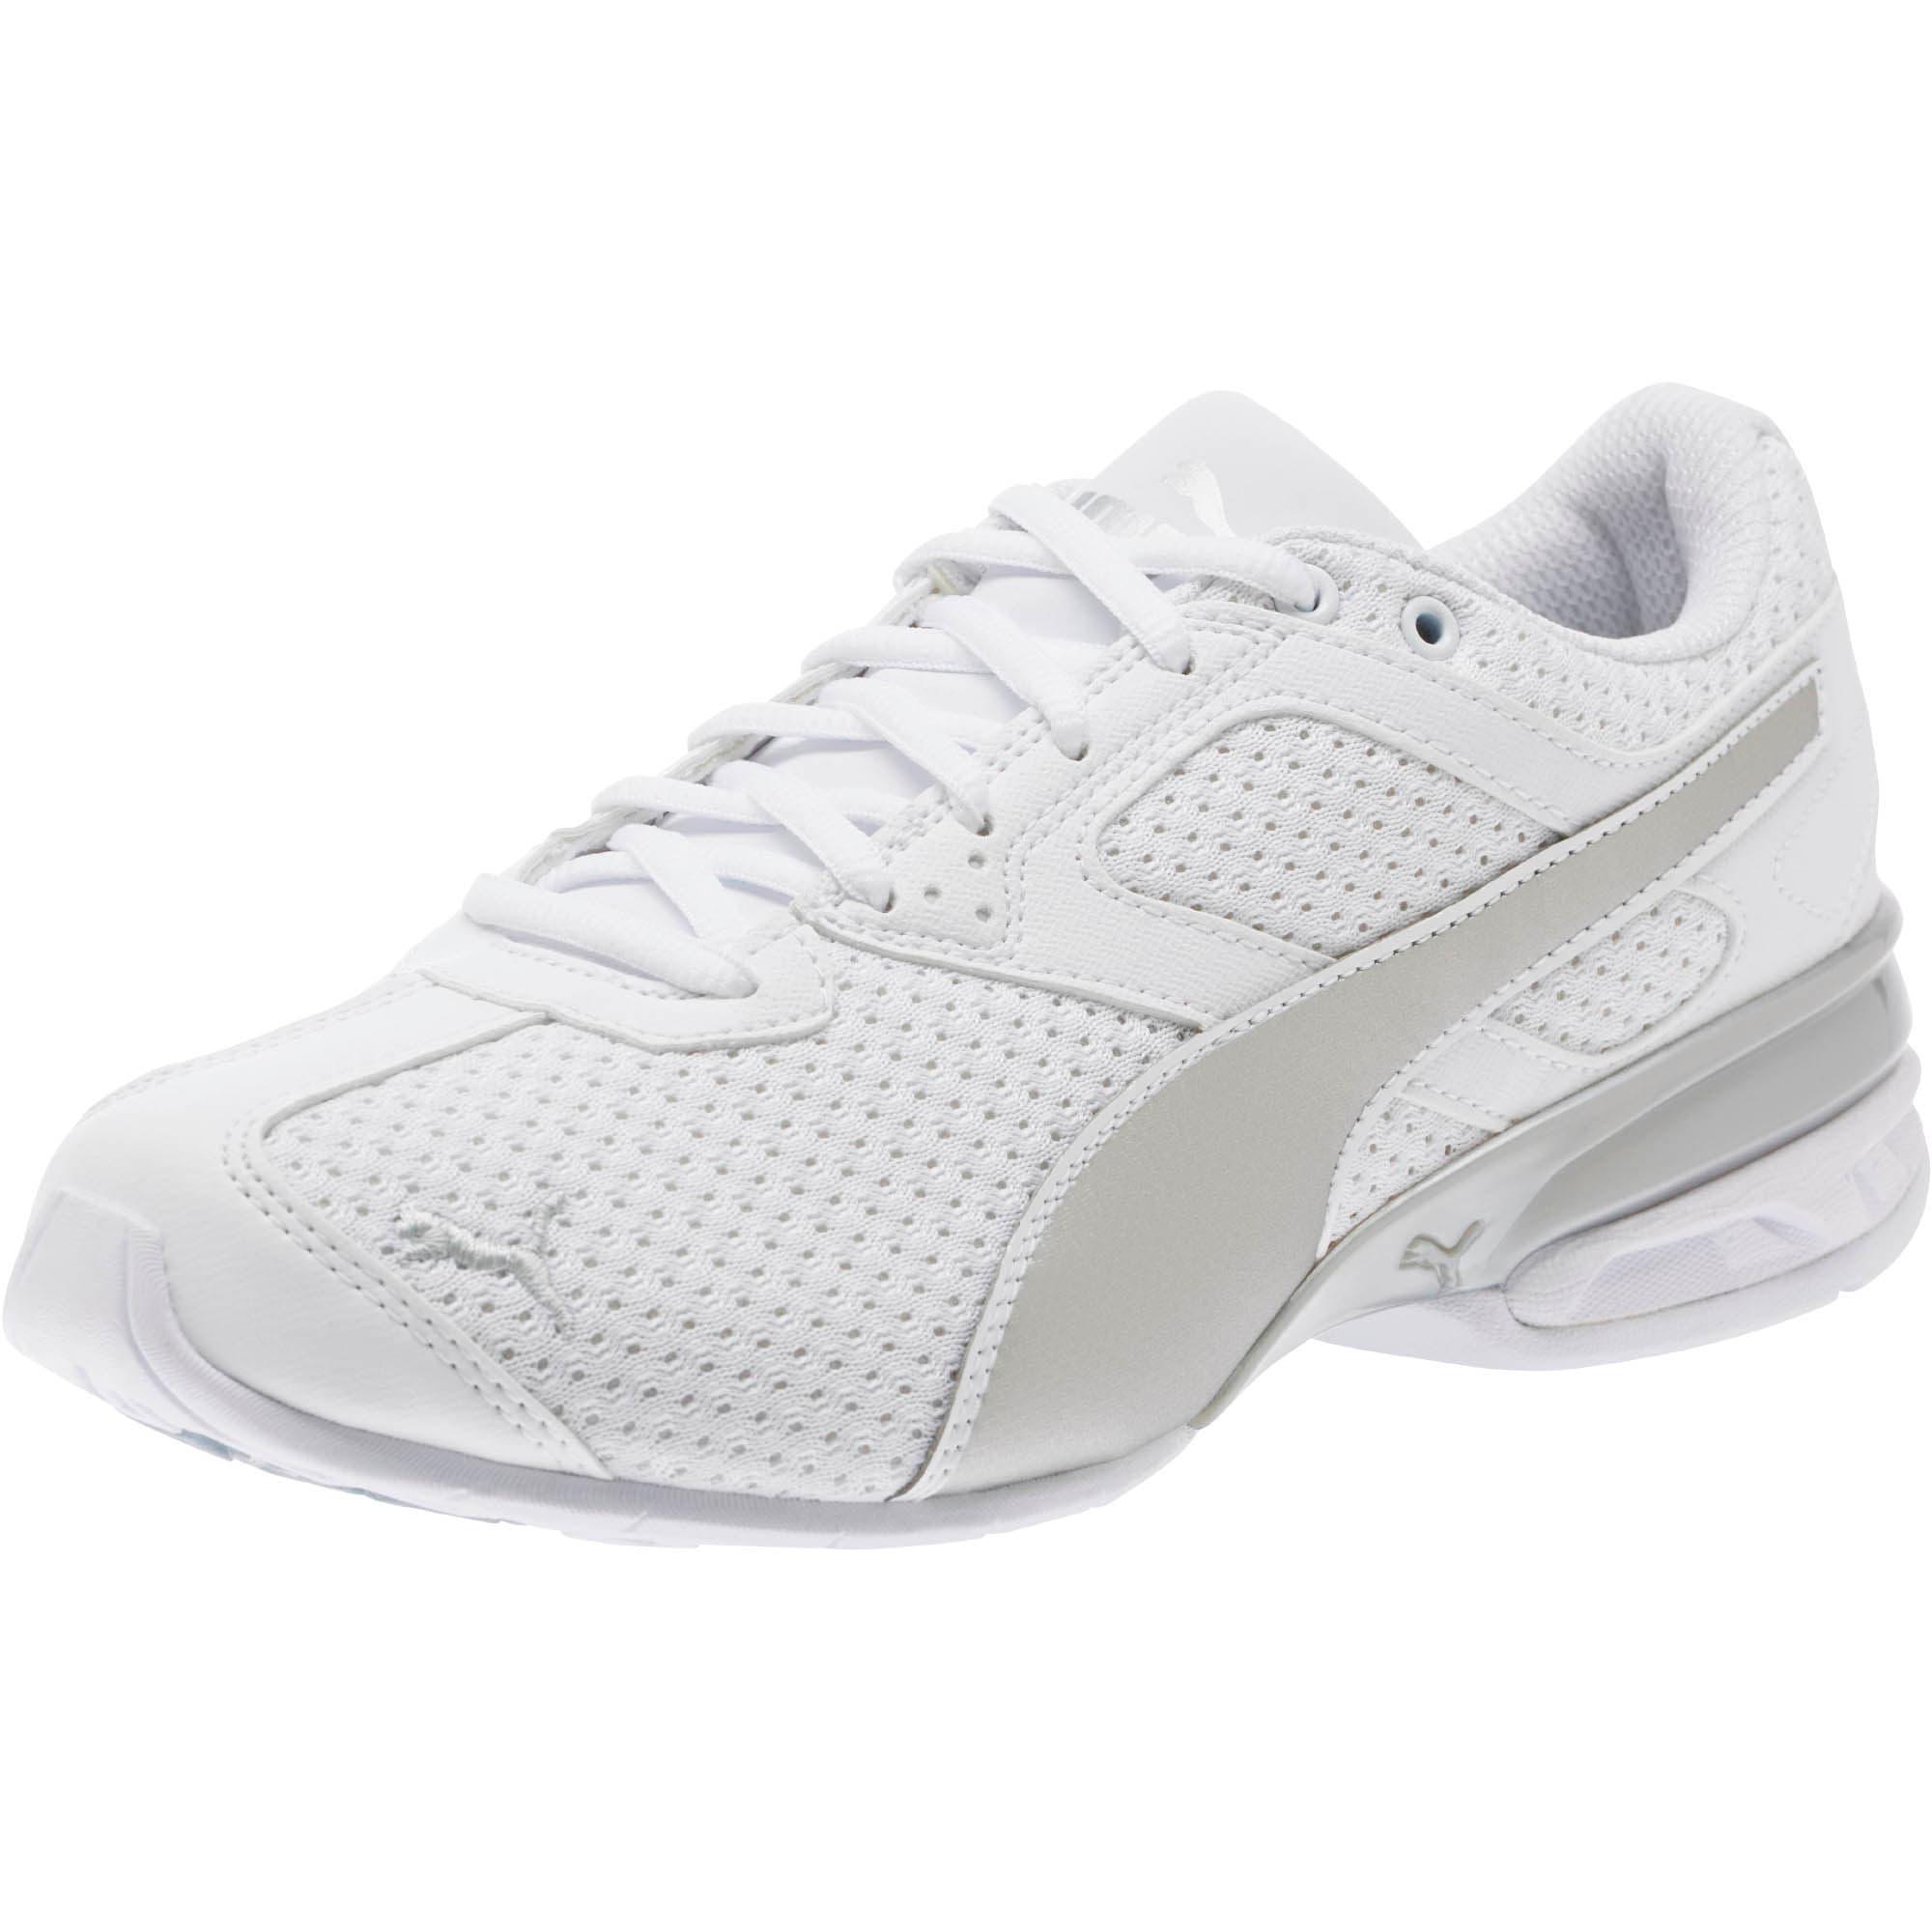 Thumbnail 1 of Tazon 6 Knit Women's Sneakers, Puma White-Puma Silver, medium